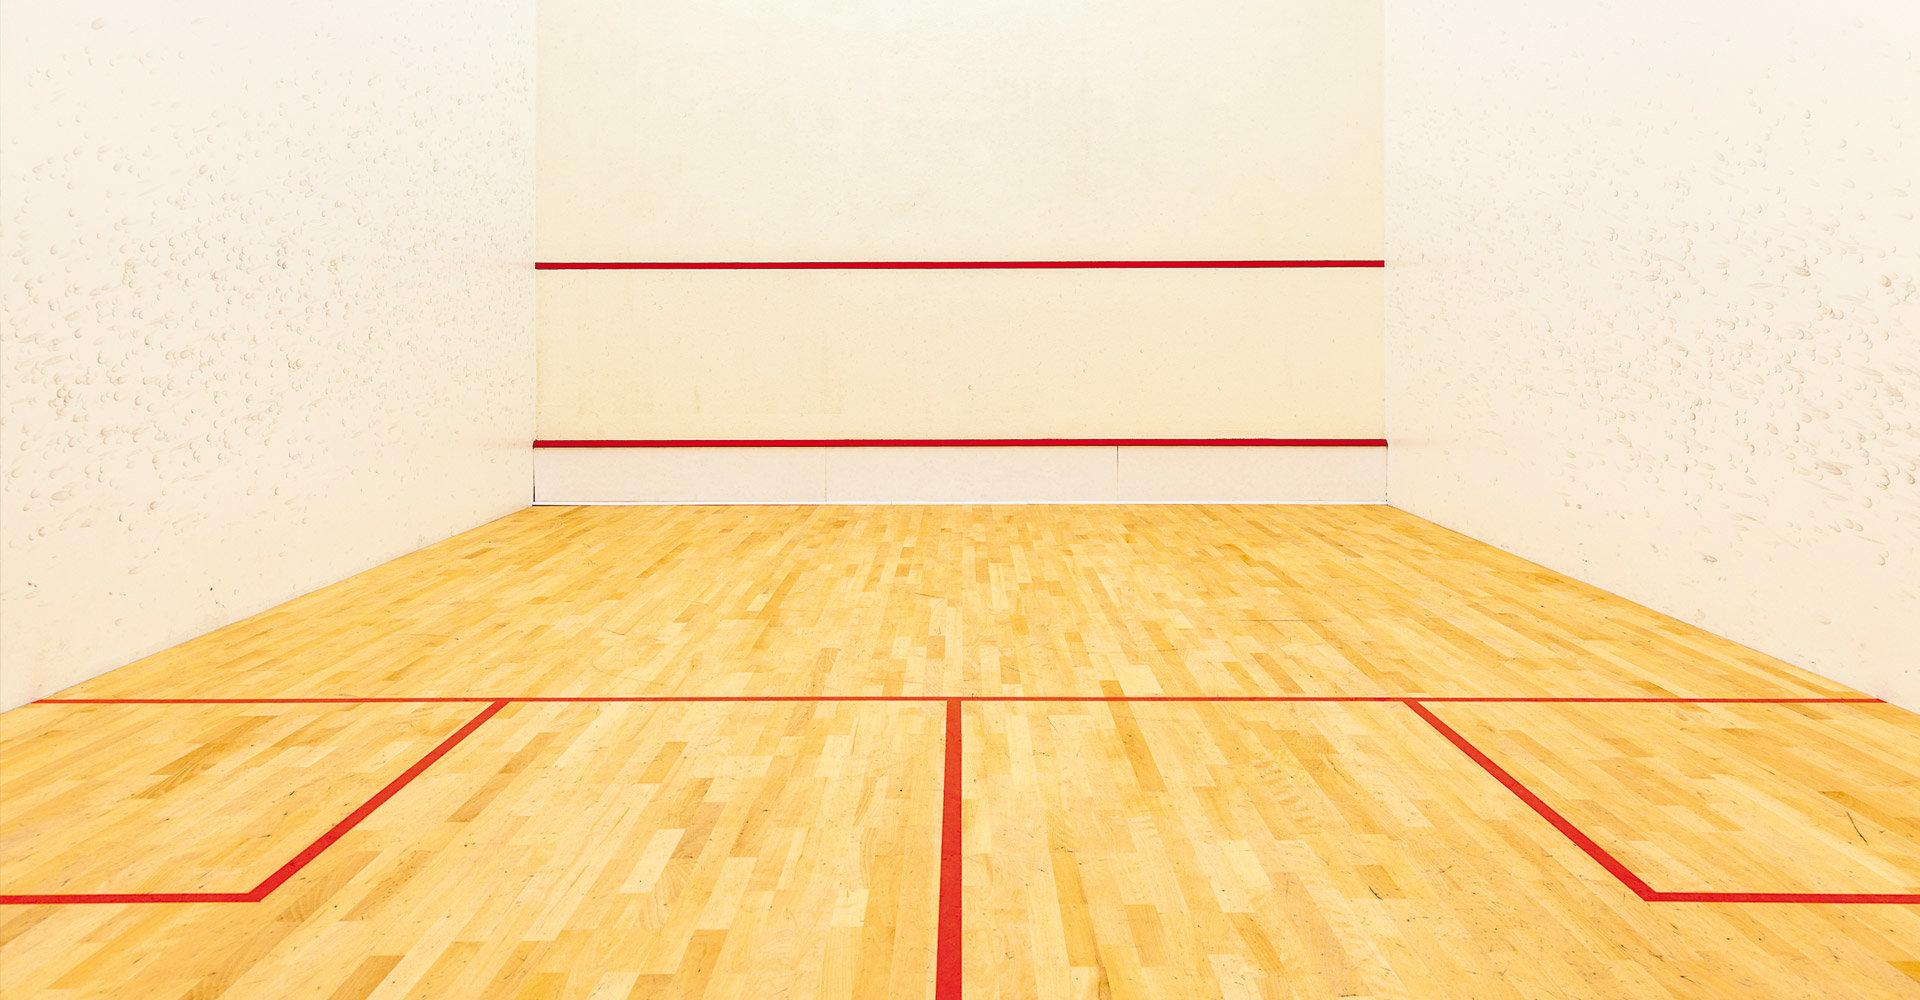 slider-squashbanen-blank-1920x1000